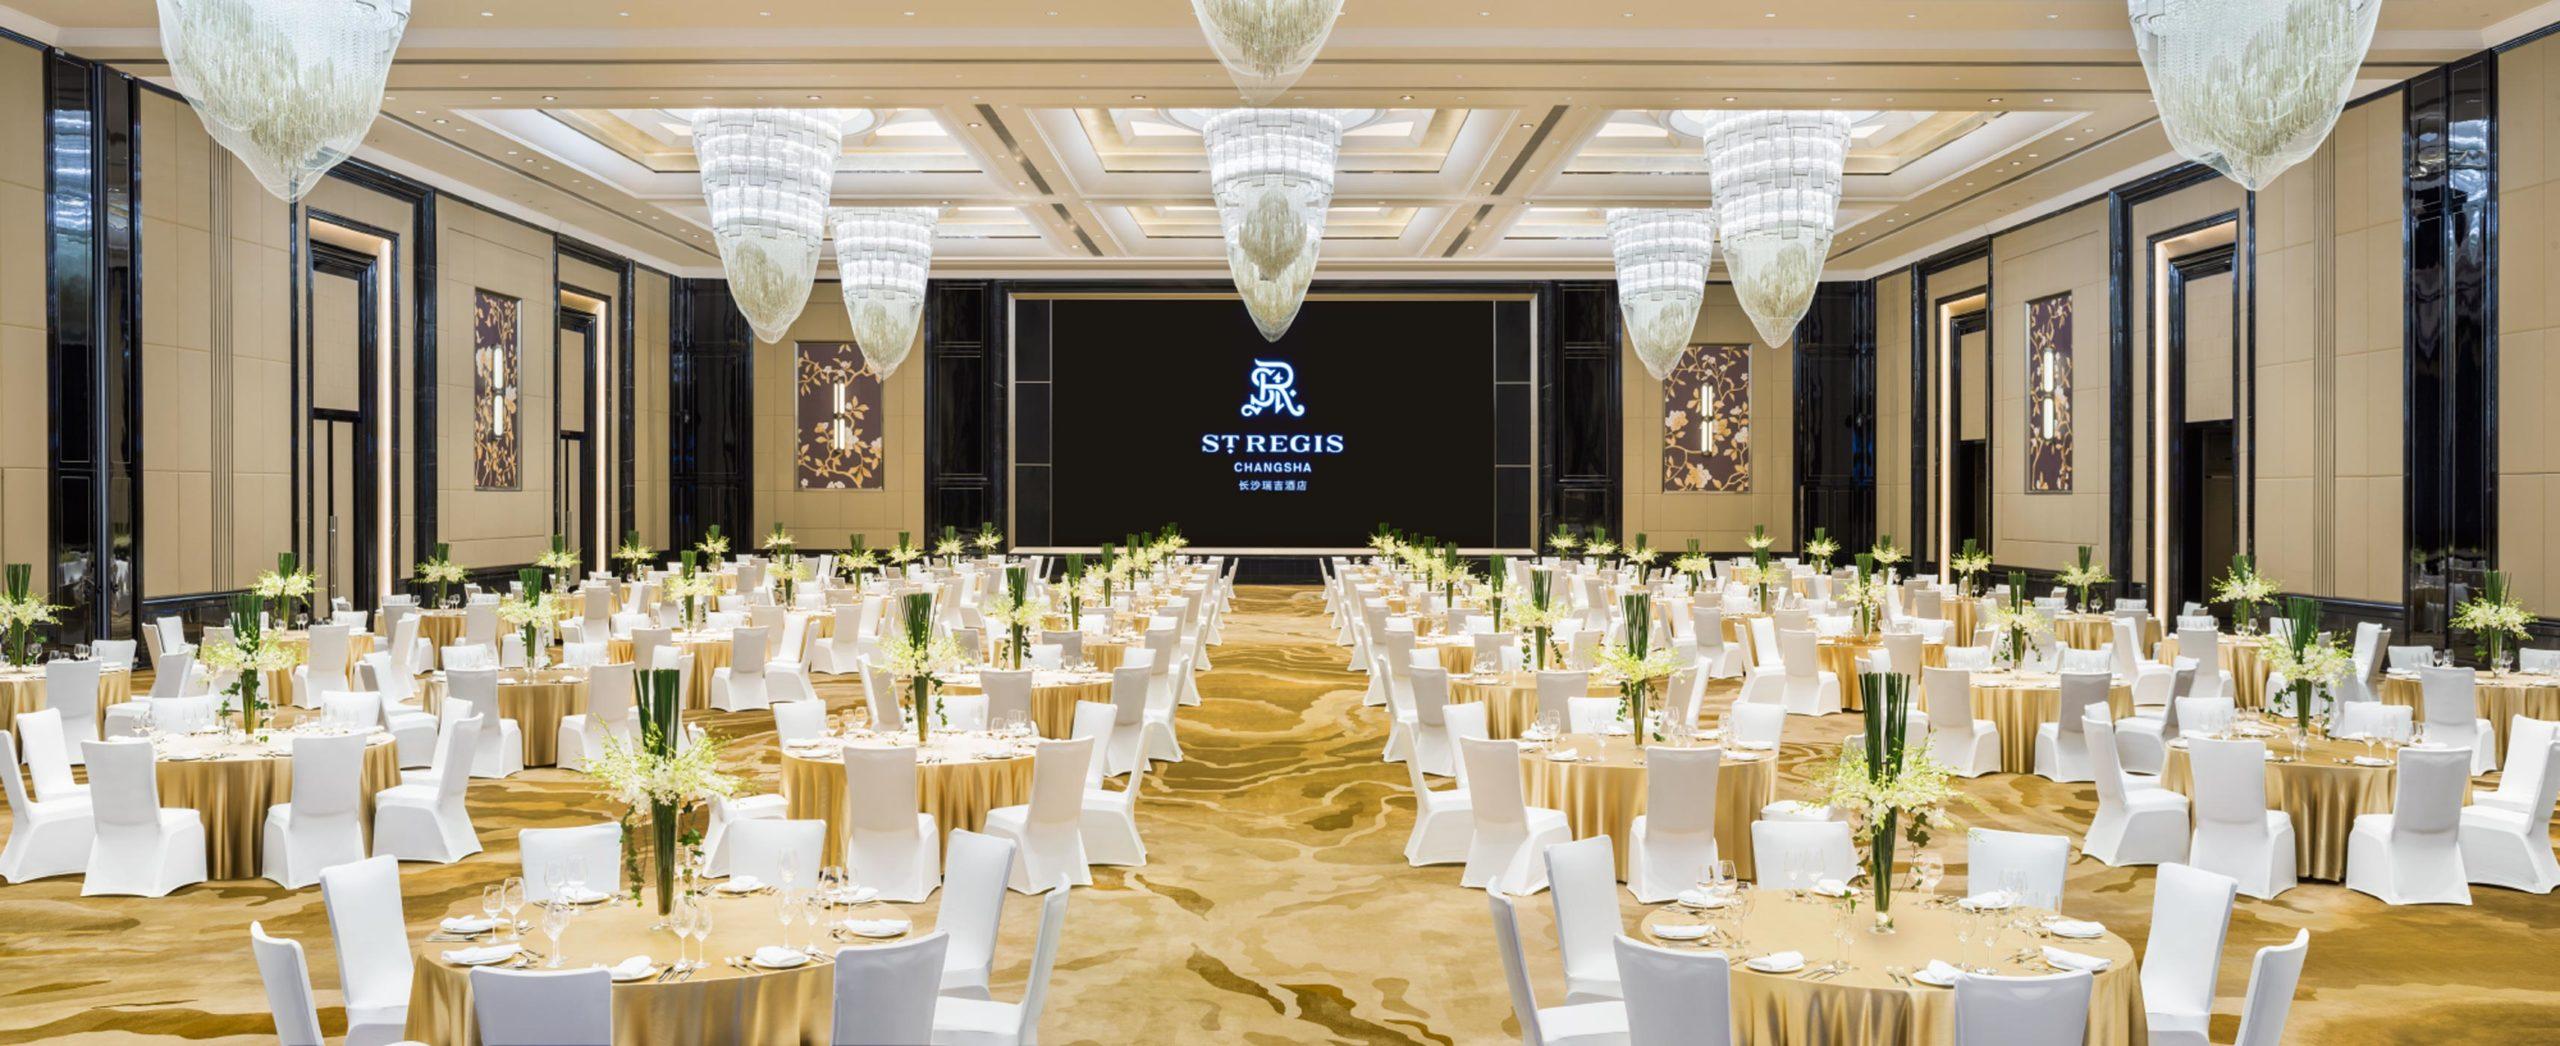 Grand-Ballroom-Gala-Dinner